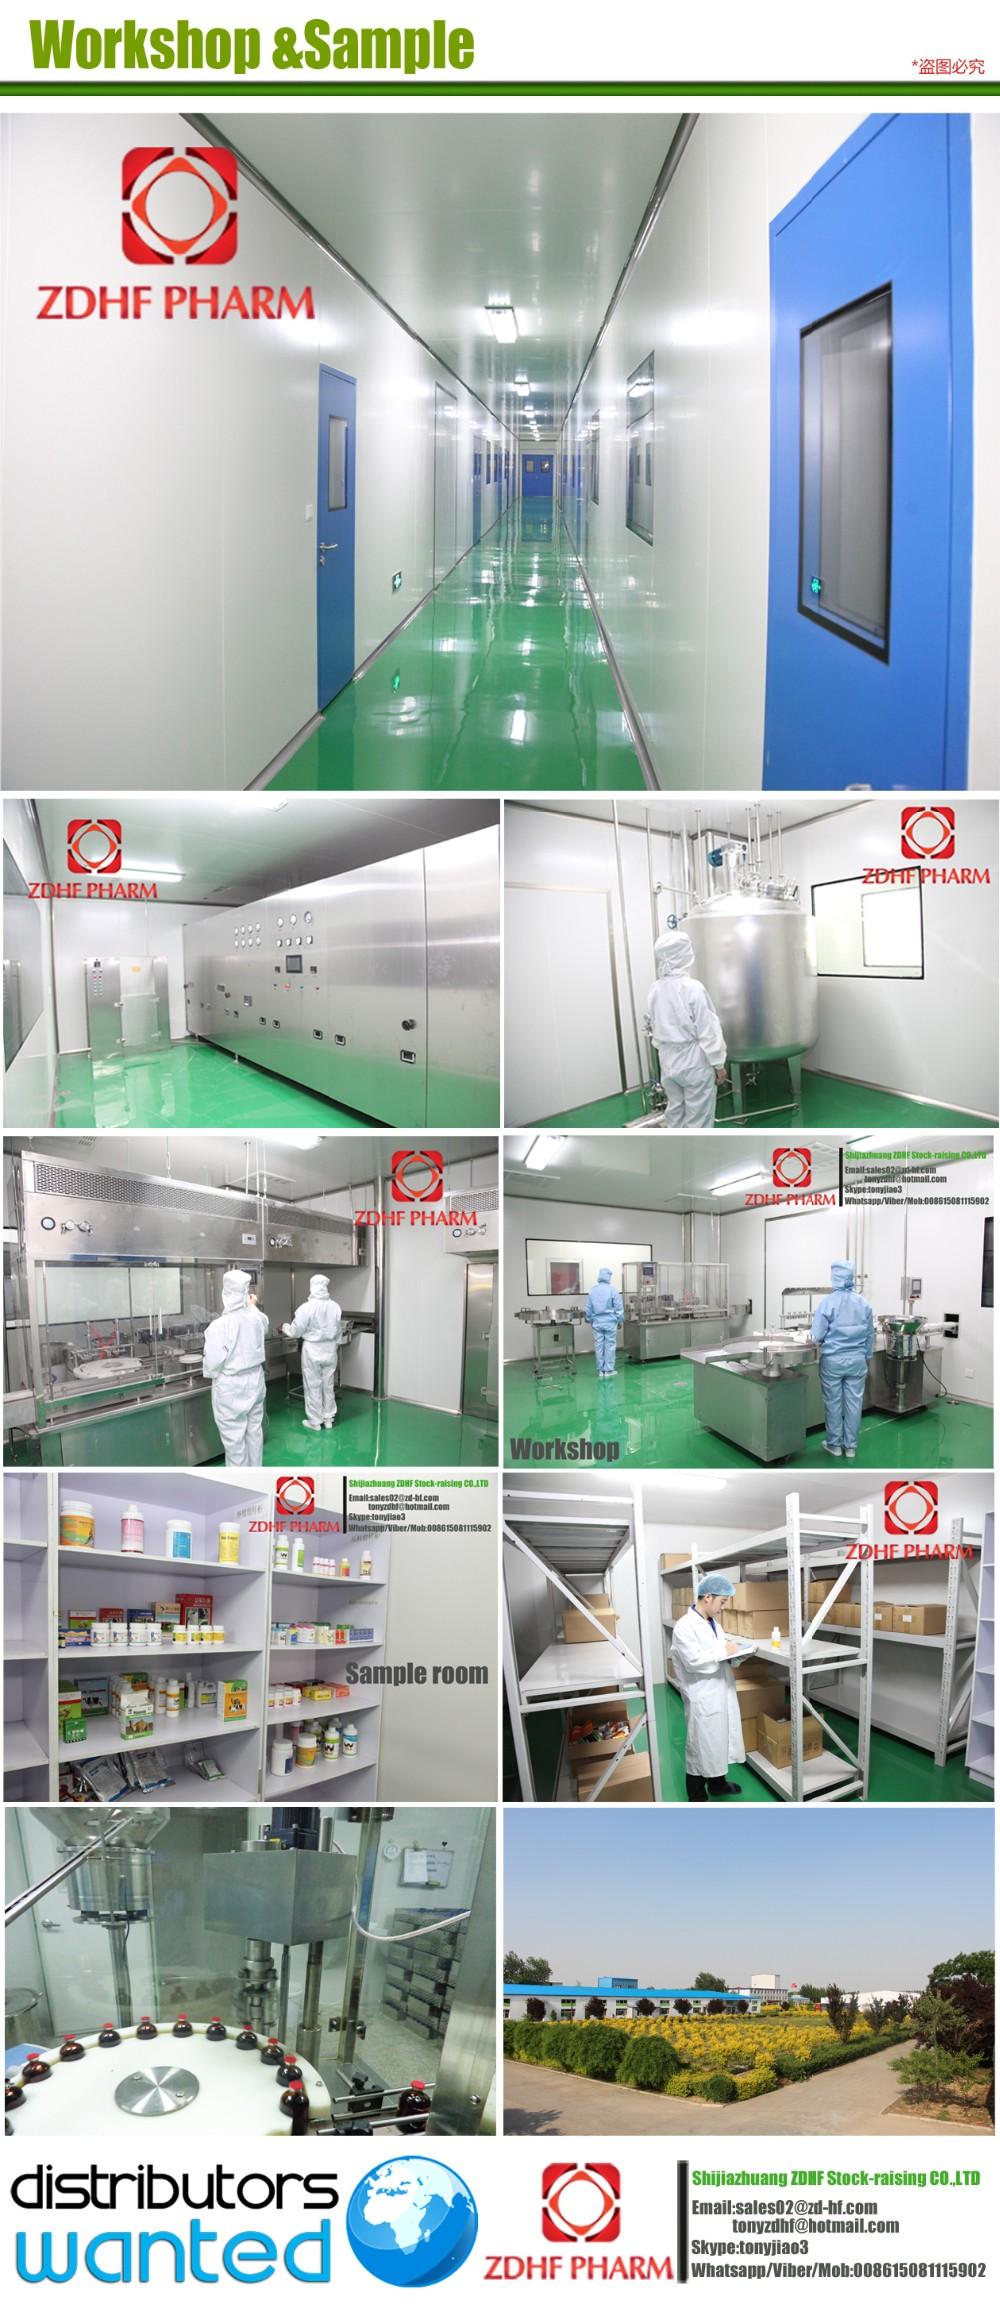 Médecine vétérinaire fabricant - ZDHF PHARMA liste des produits